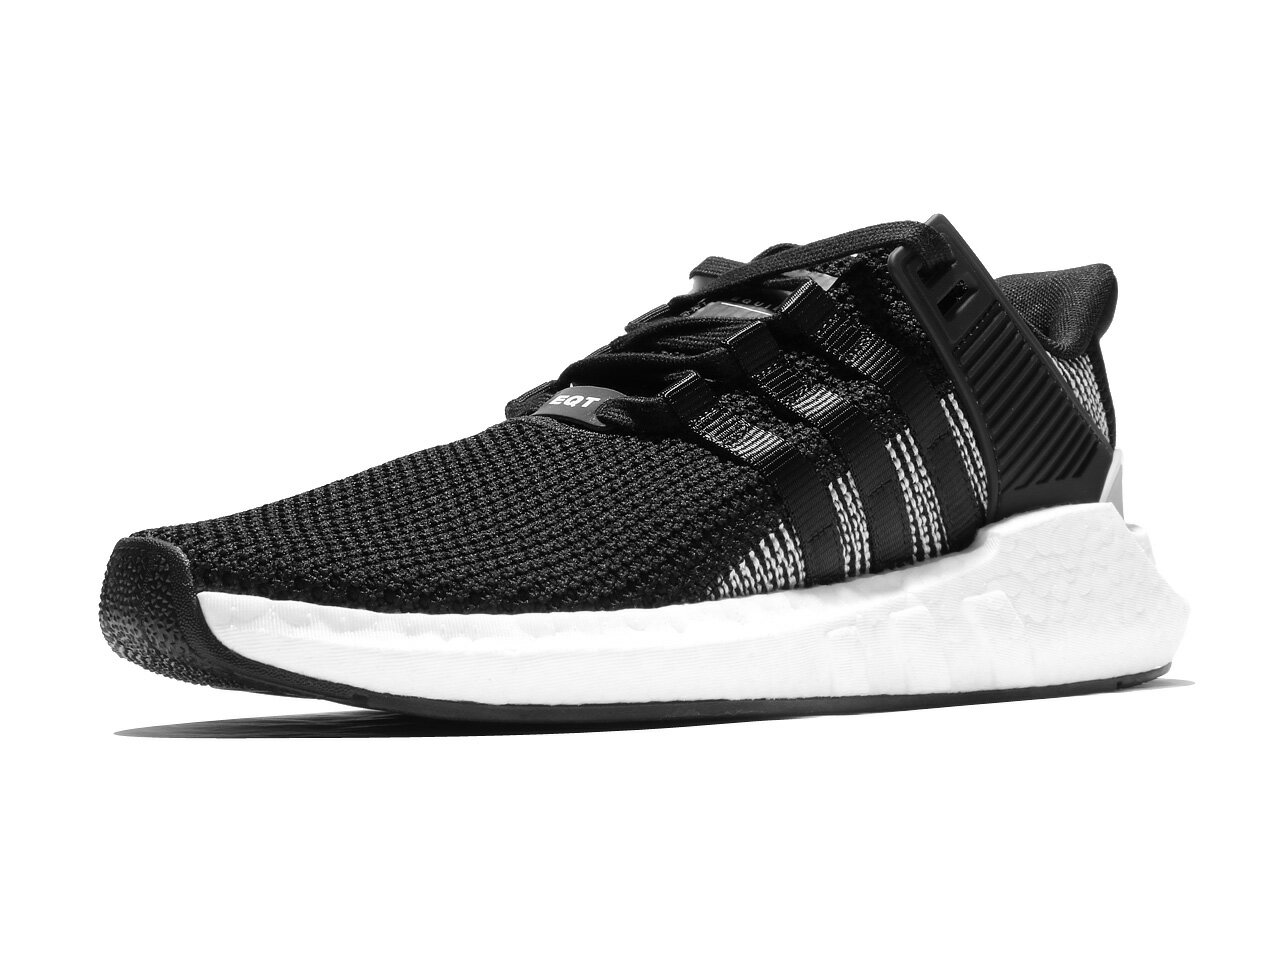 BY9509 Adidas Men EQT SUPPORT 93//17 black cblack ftwwht